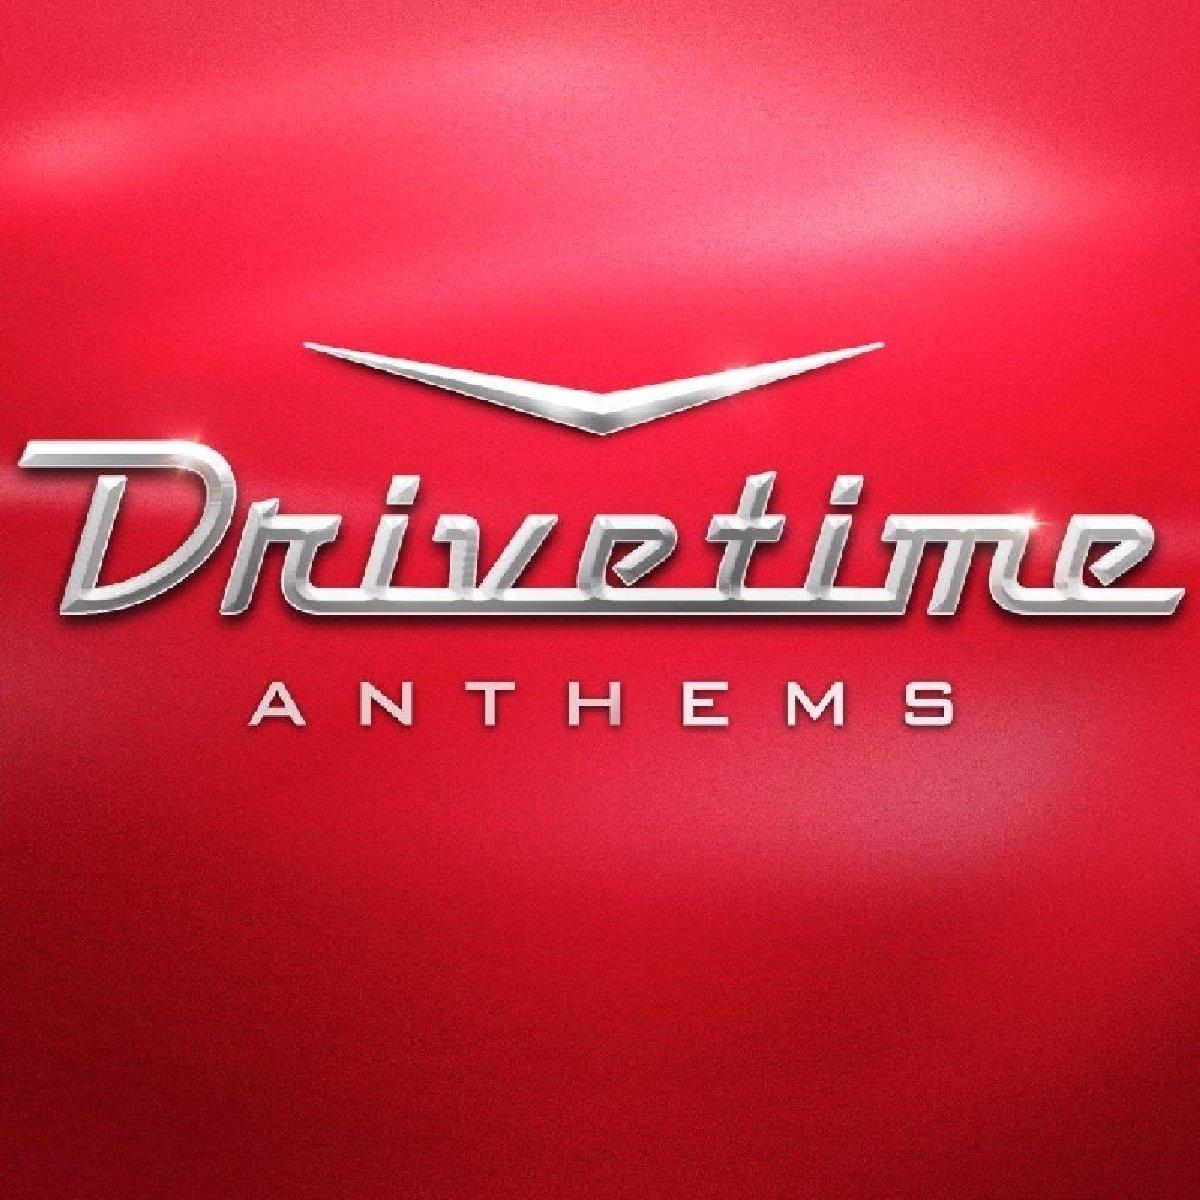 Drivetime Anthems 4 CD Boxset only £3.99 (Prime £6.98 (Non Prime) on Amazon